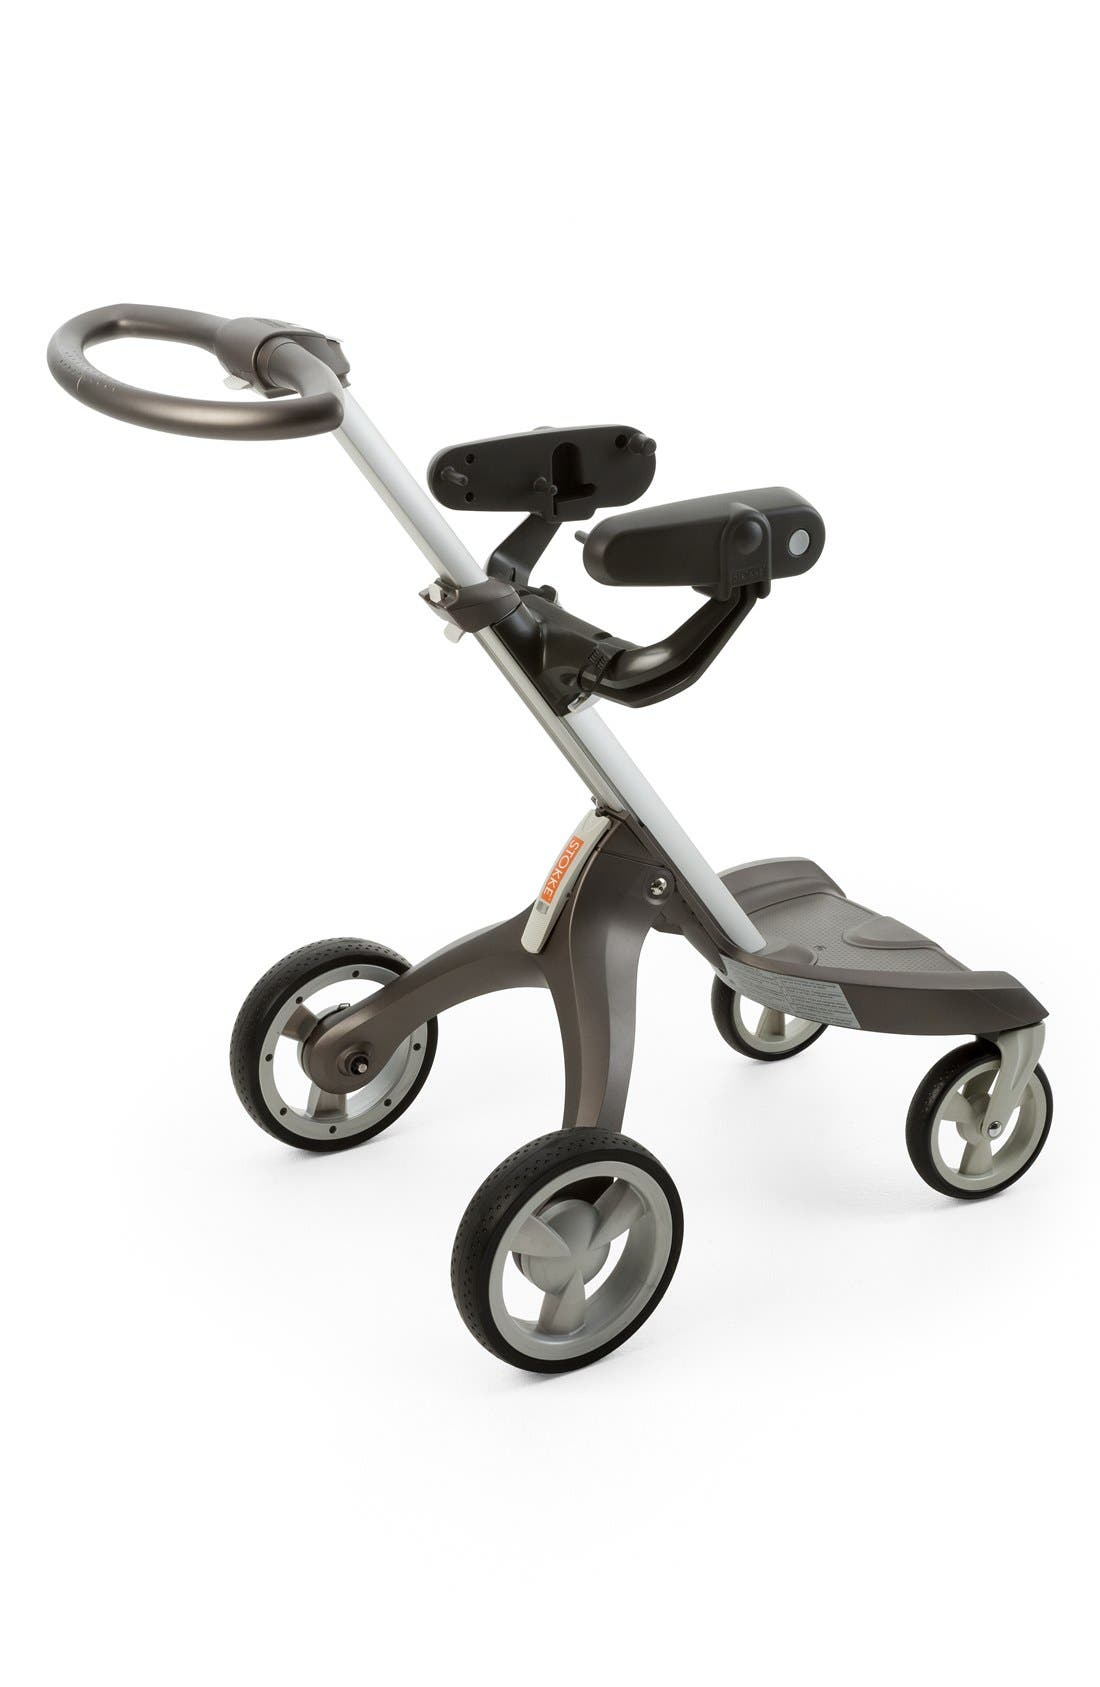 Peg Perego Car Seat Adaptor for Stokke Strollers,                             Alternate thumbnail 2, color,                             020